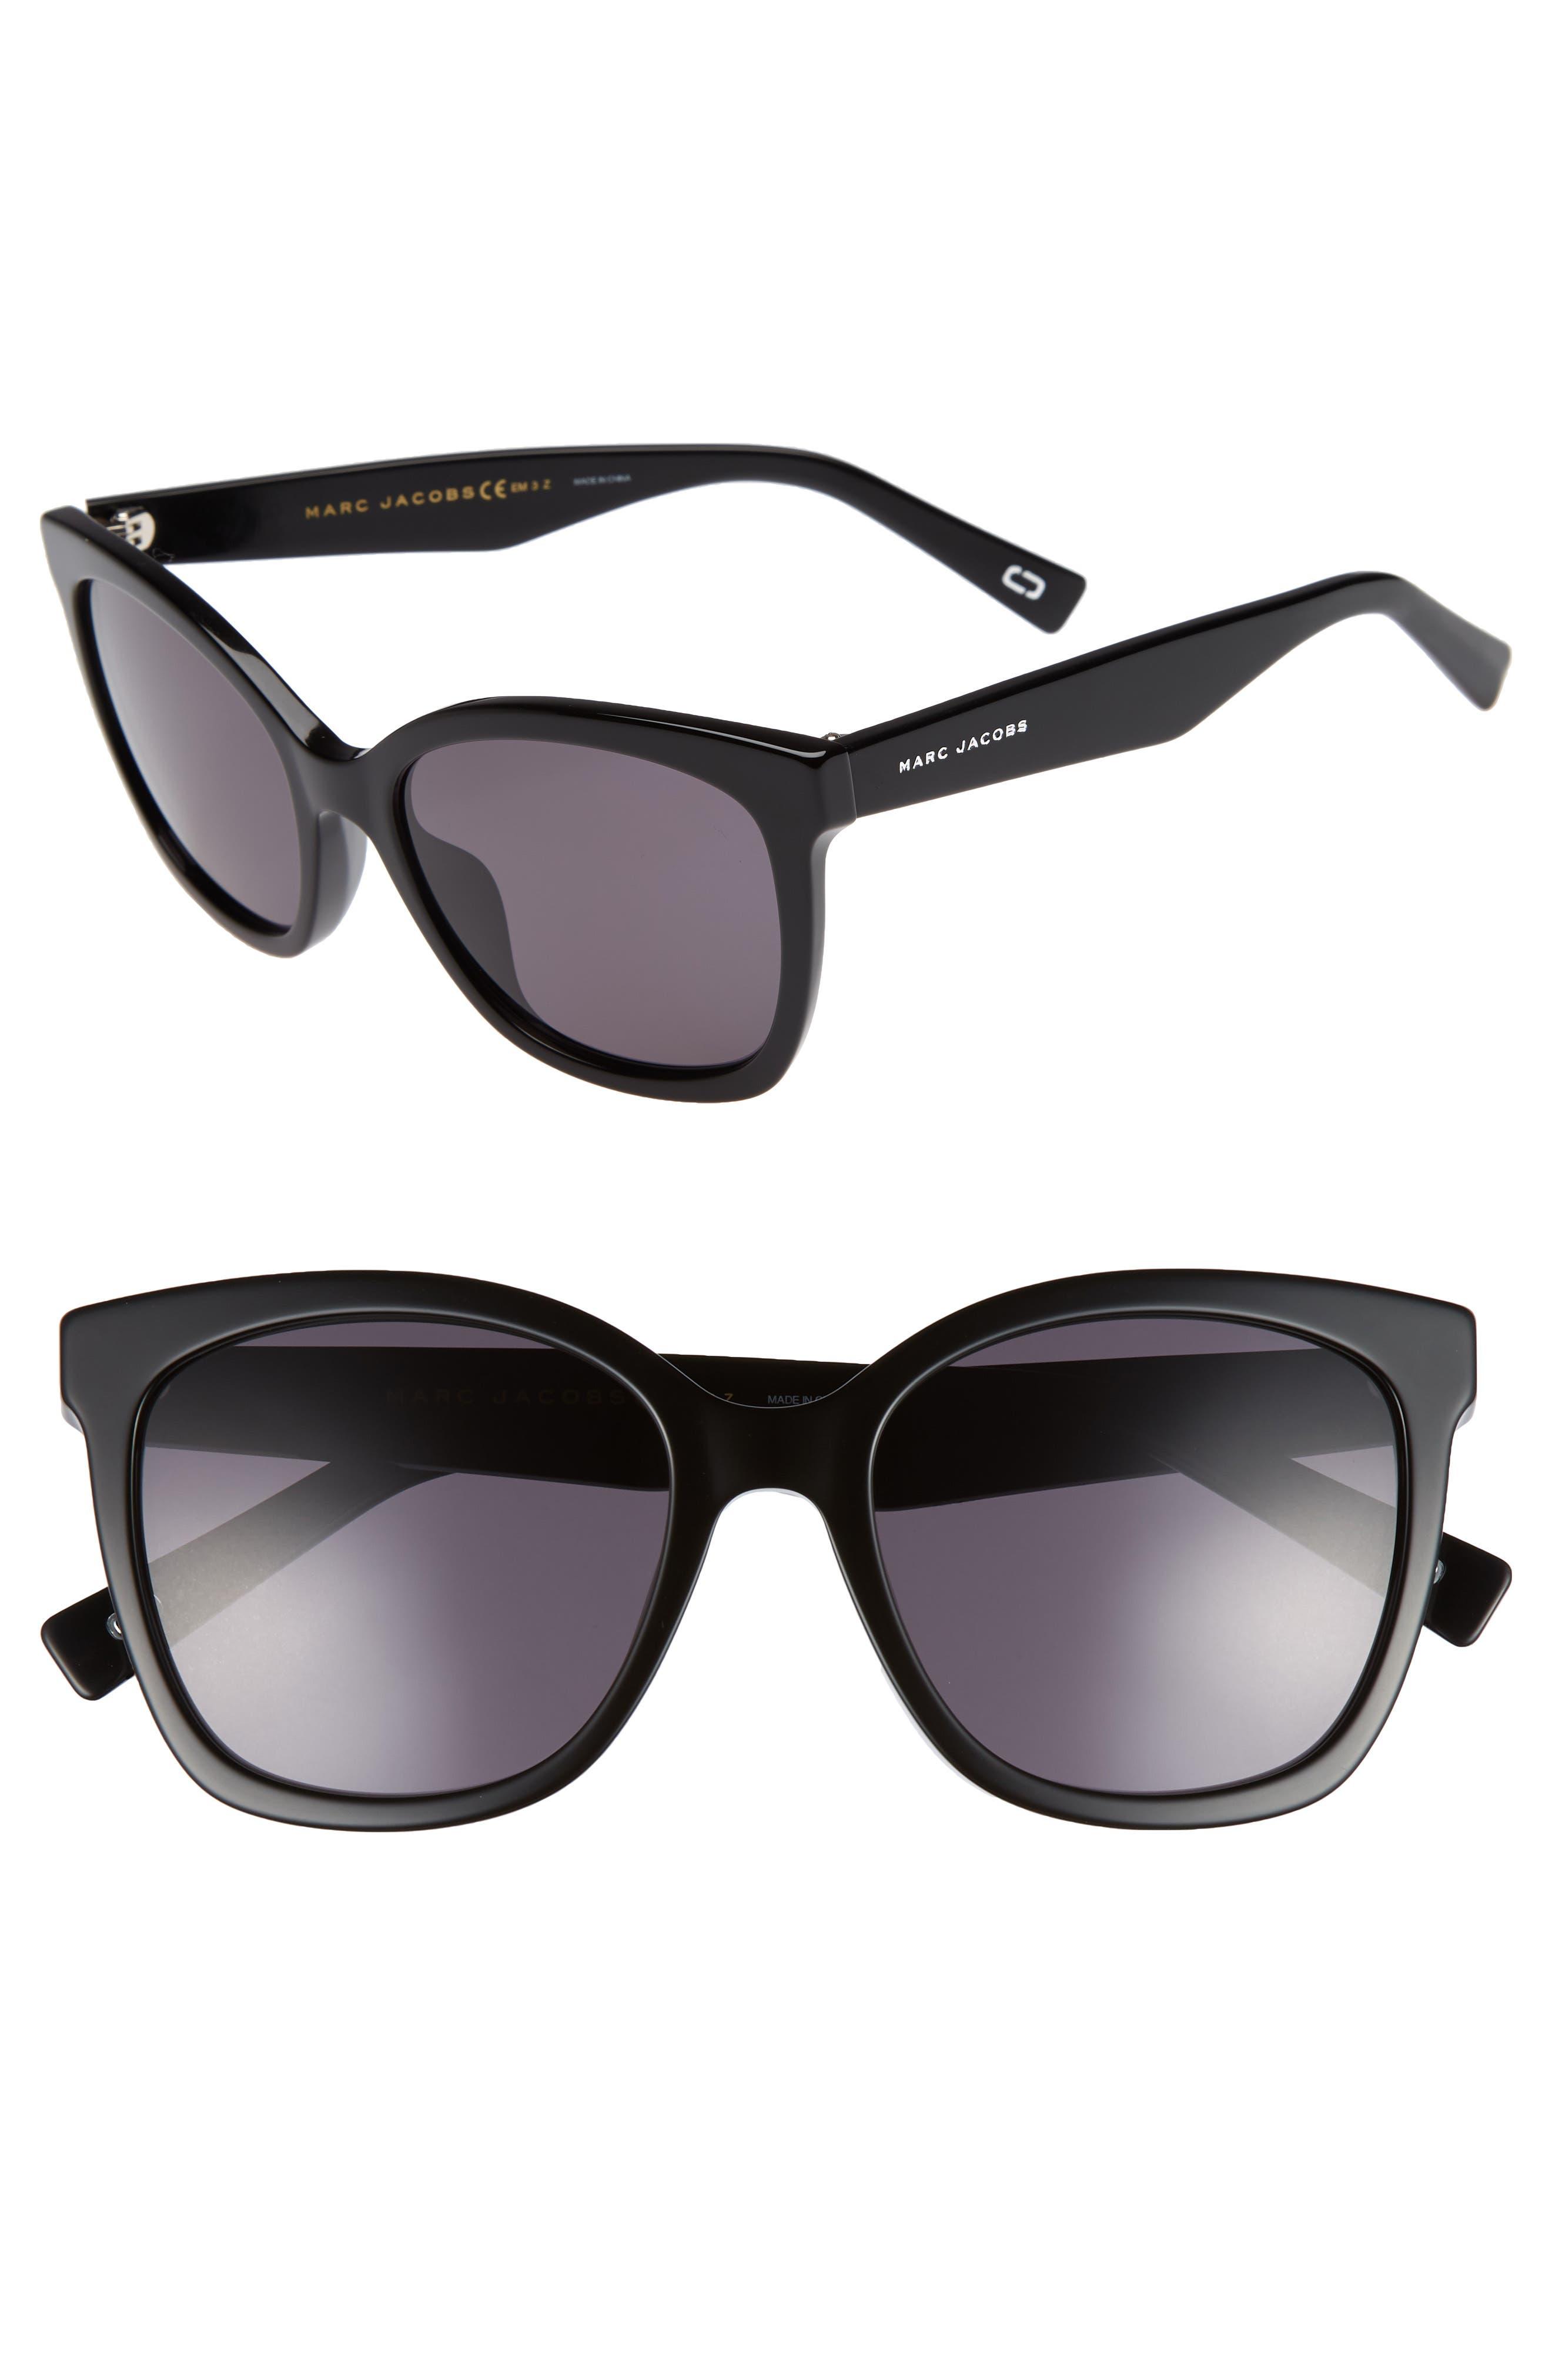 54mm Gradient Lens Sunglasses,                             Main thumbnail 1, color,                             Black Polar